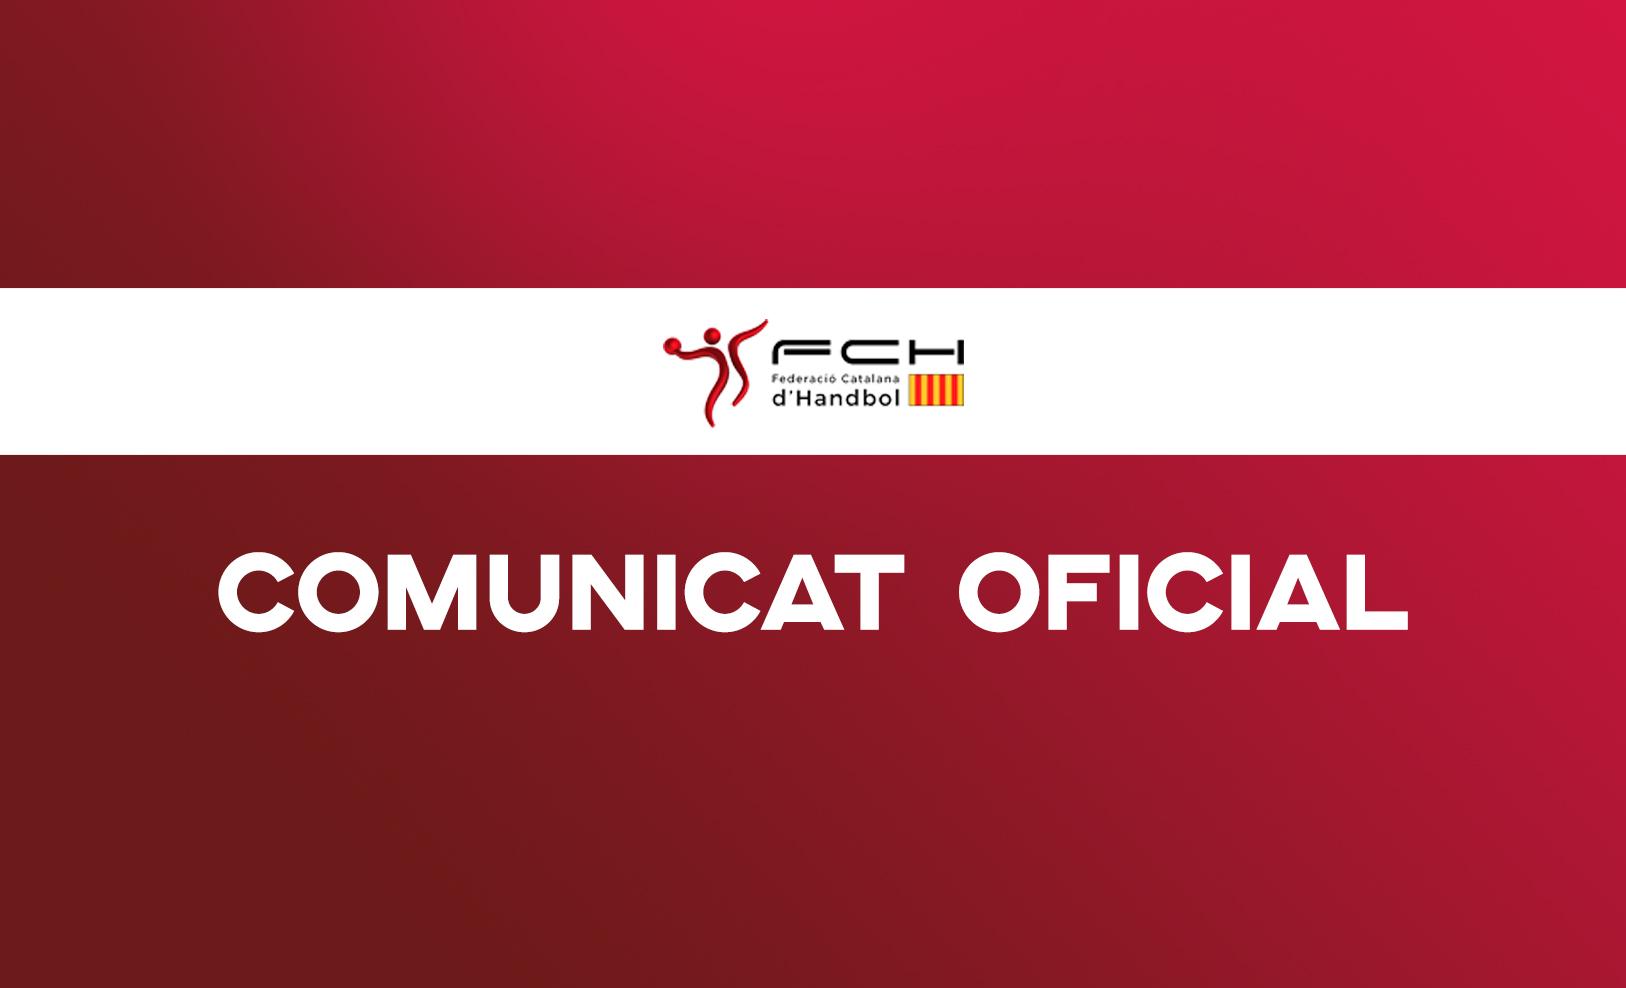 COMUNICAT OFICIAL DE LA FCH